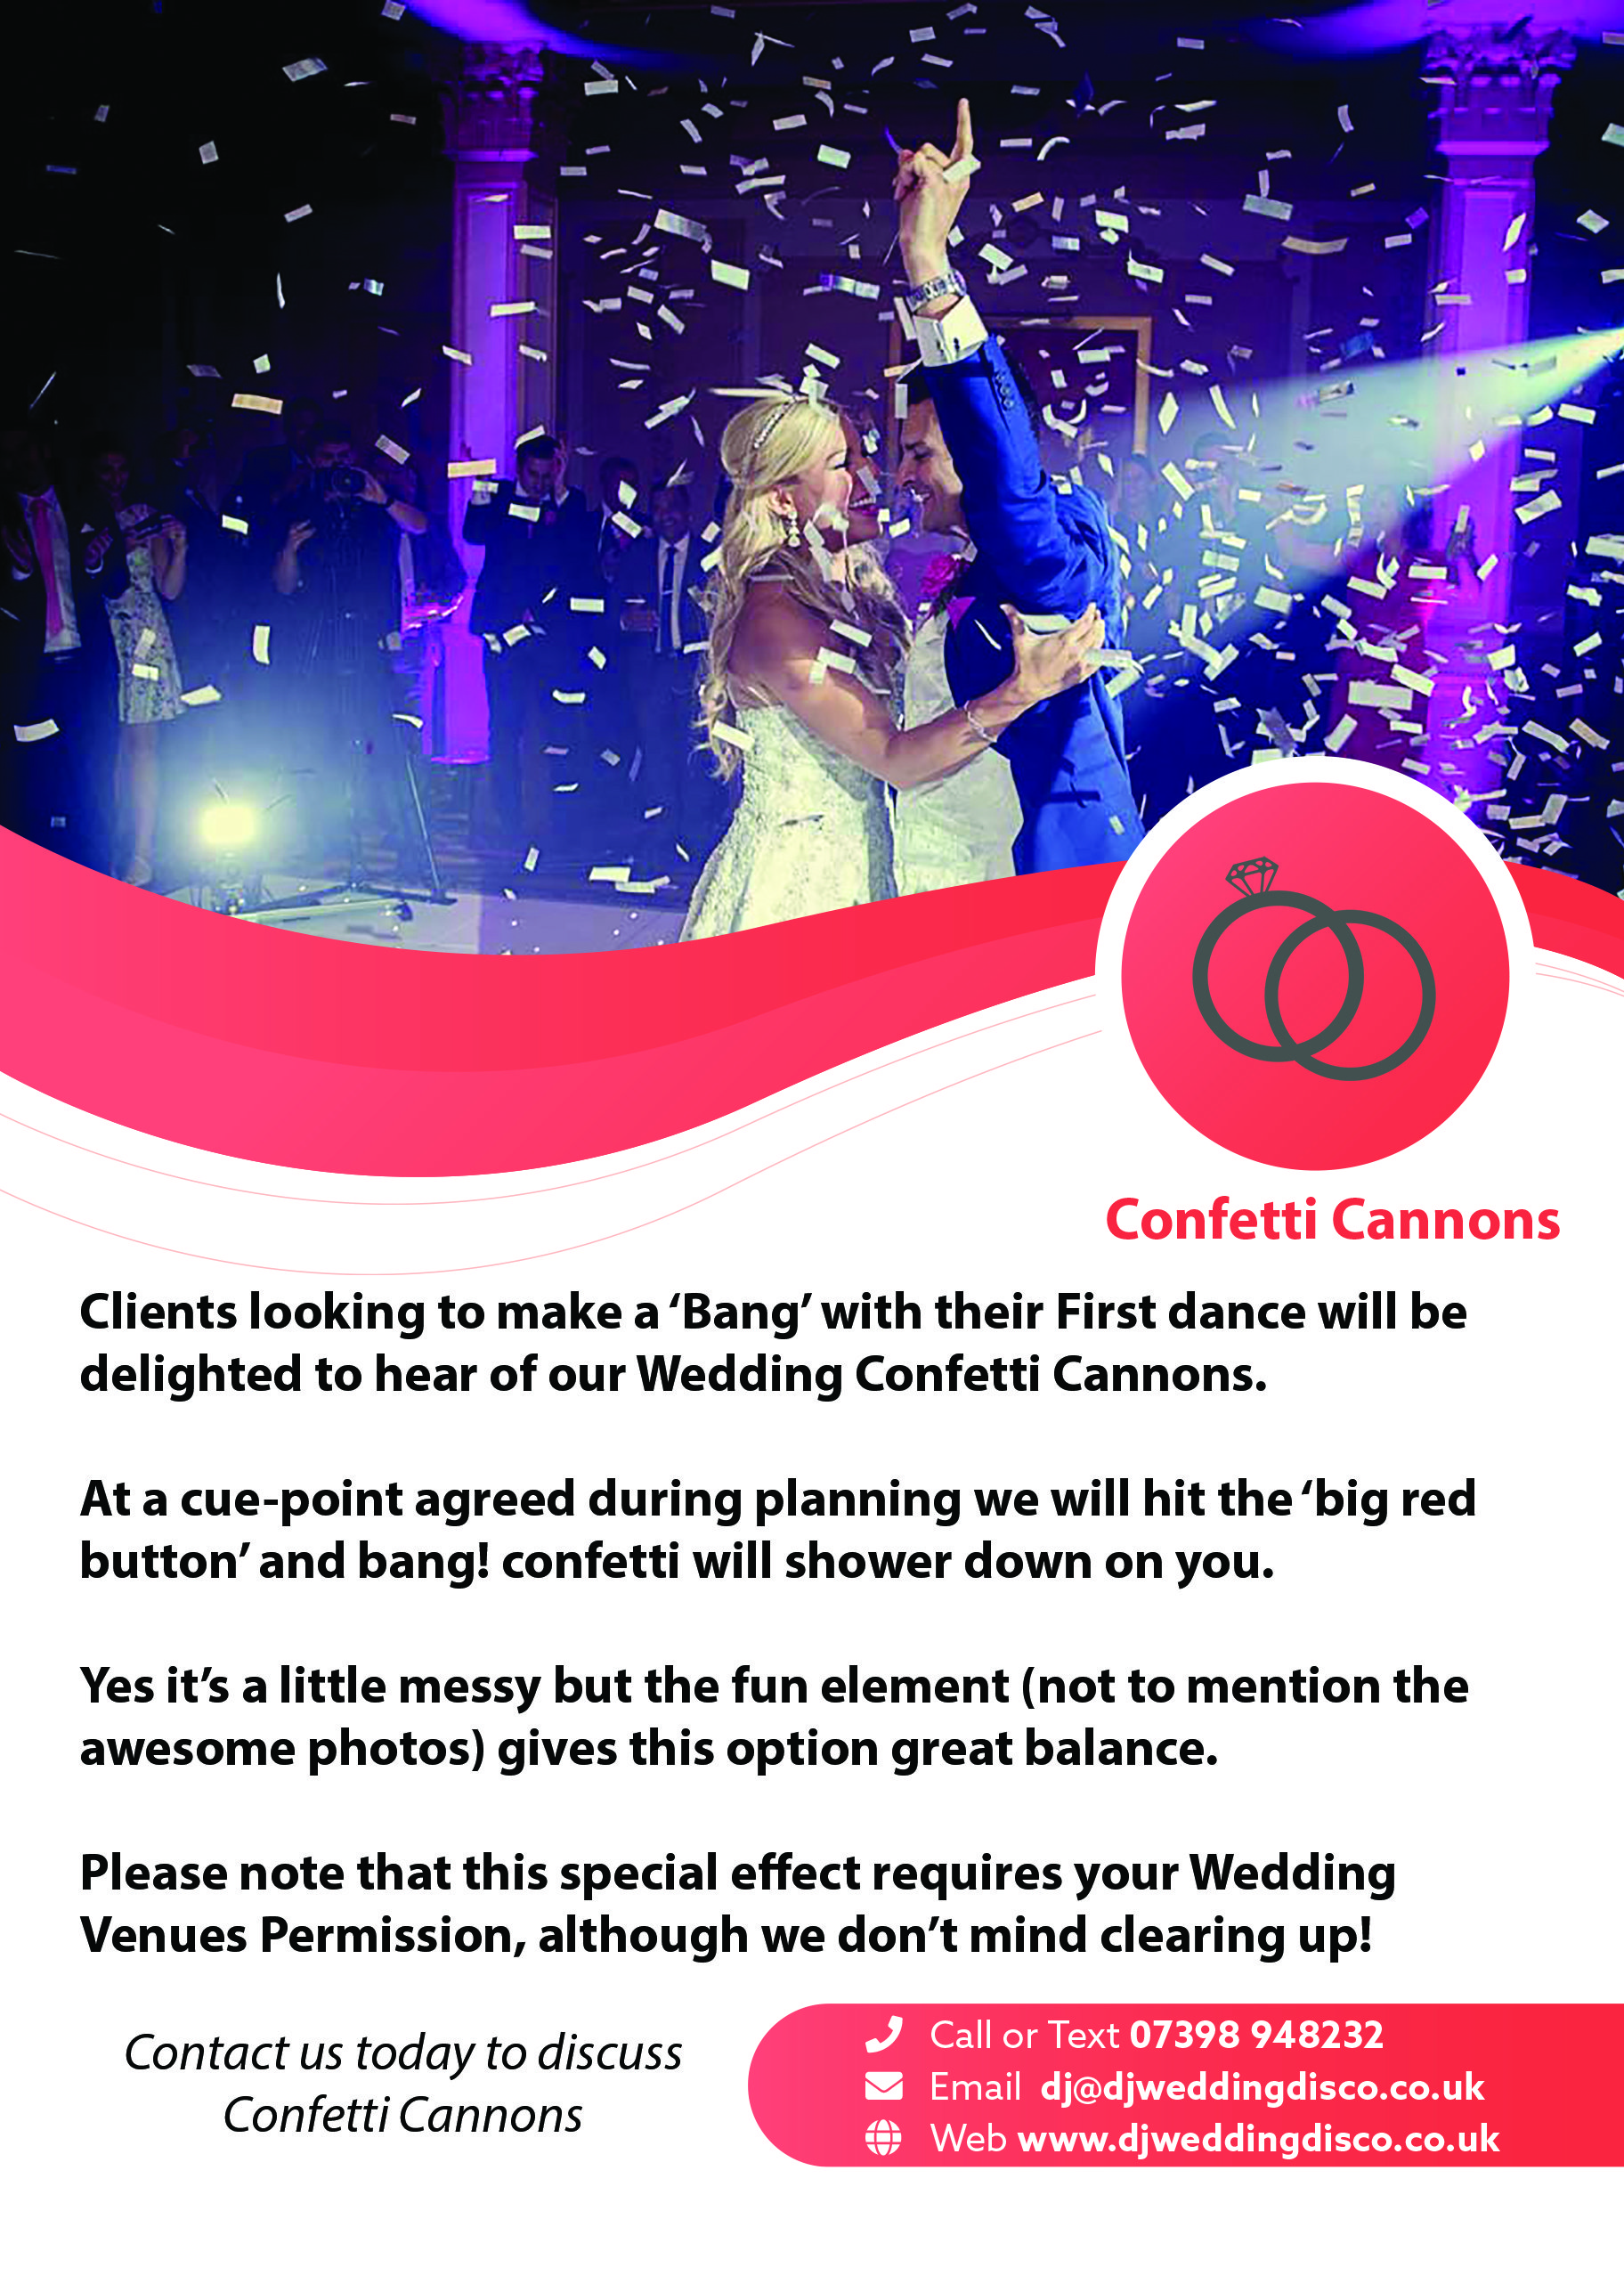 Confetti Cannons - DJ Wedding Disco